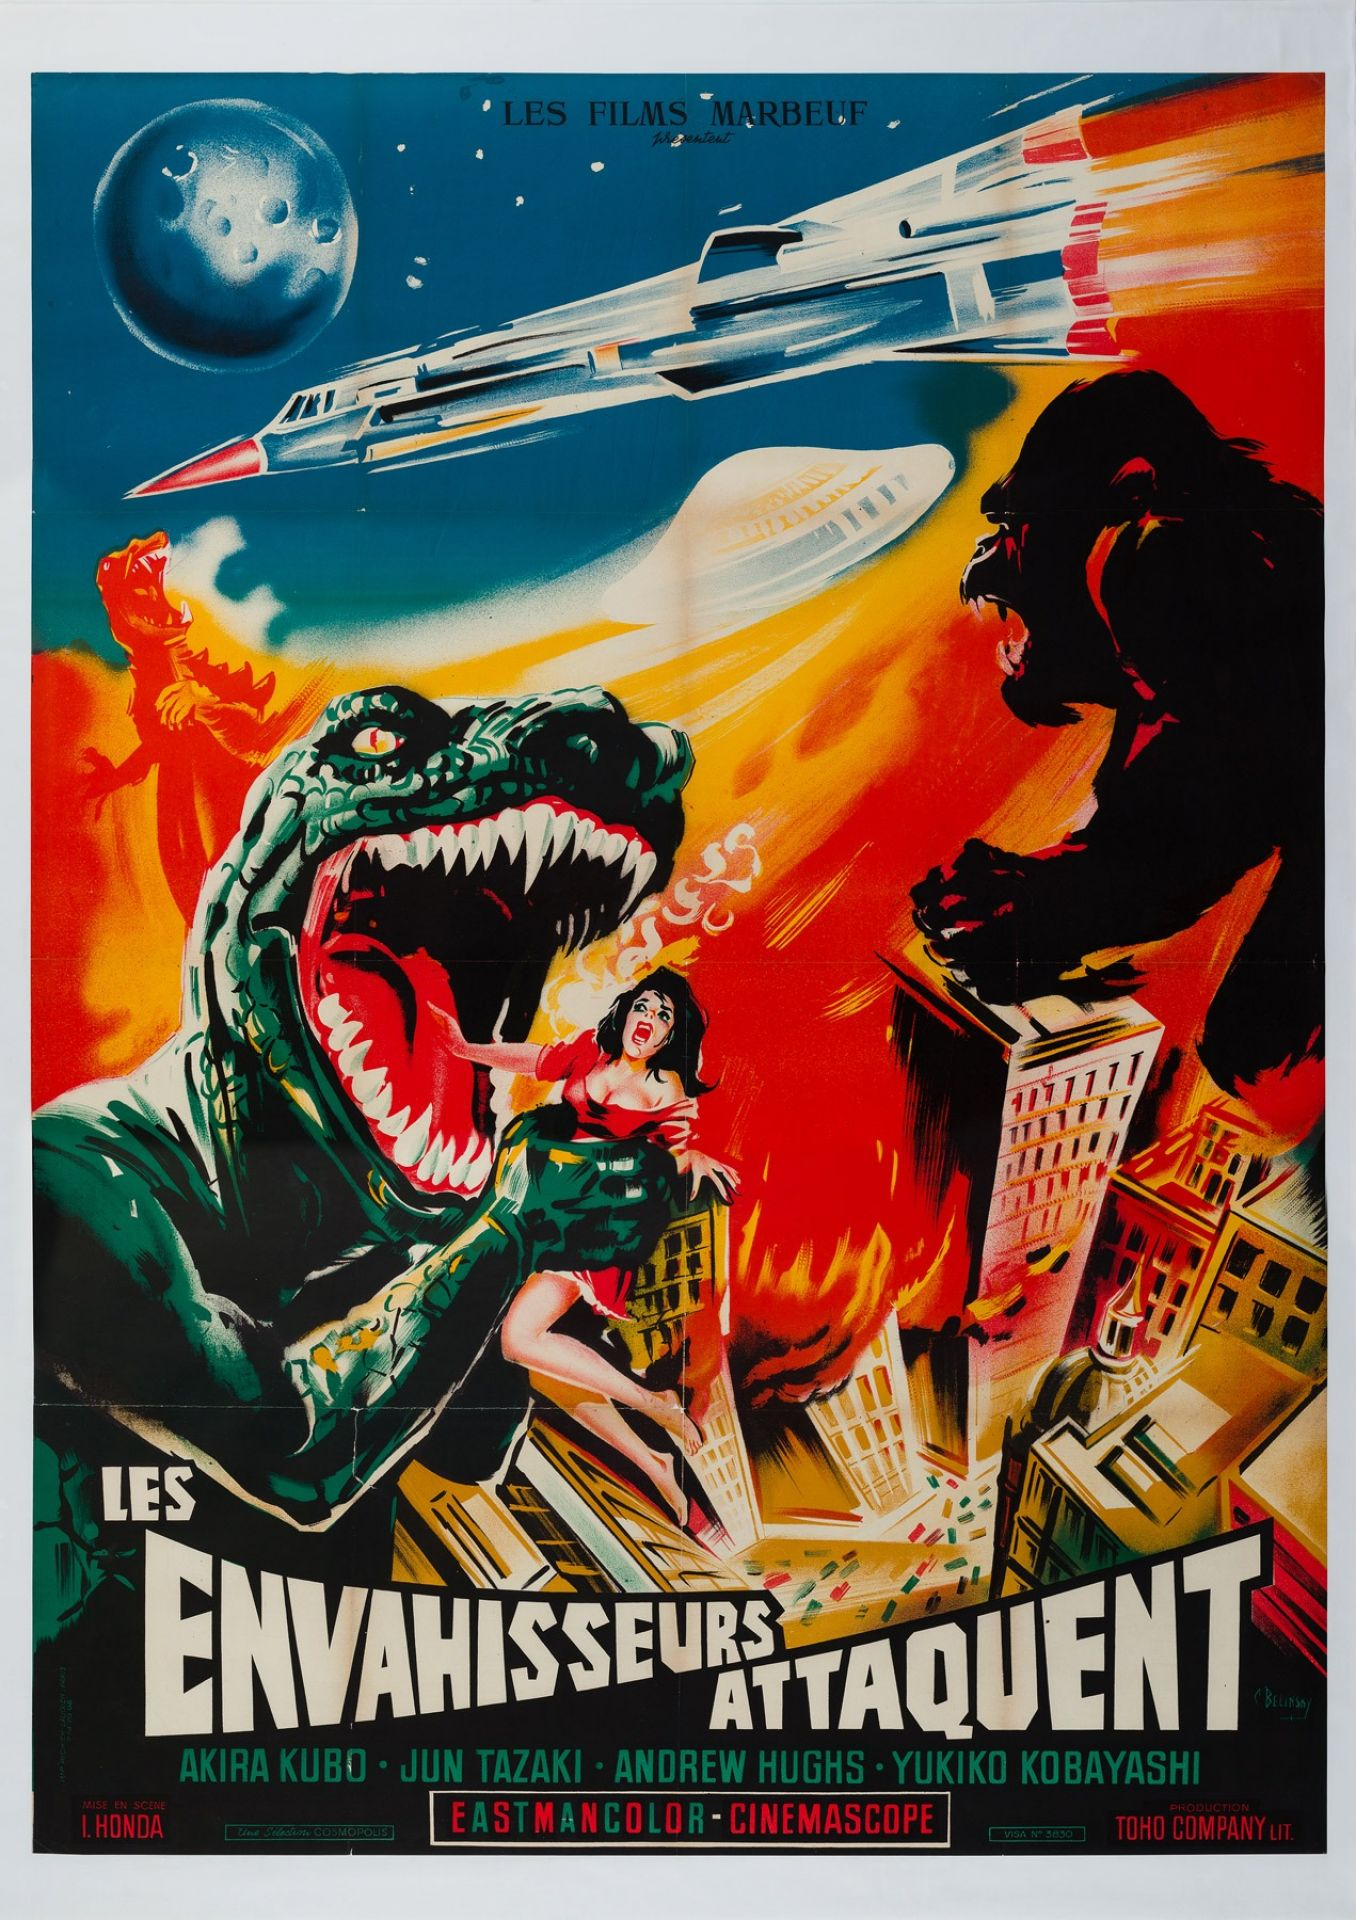 Original Destroy All Monsters 1970 French Film Movie Poster, ConstantineBelinsky